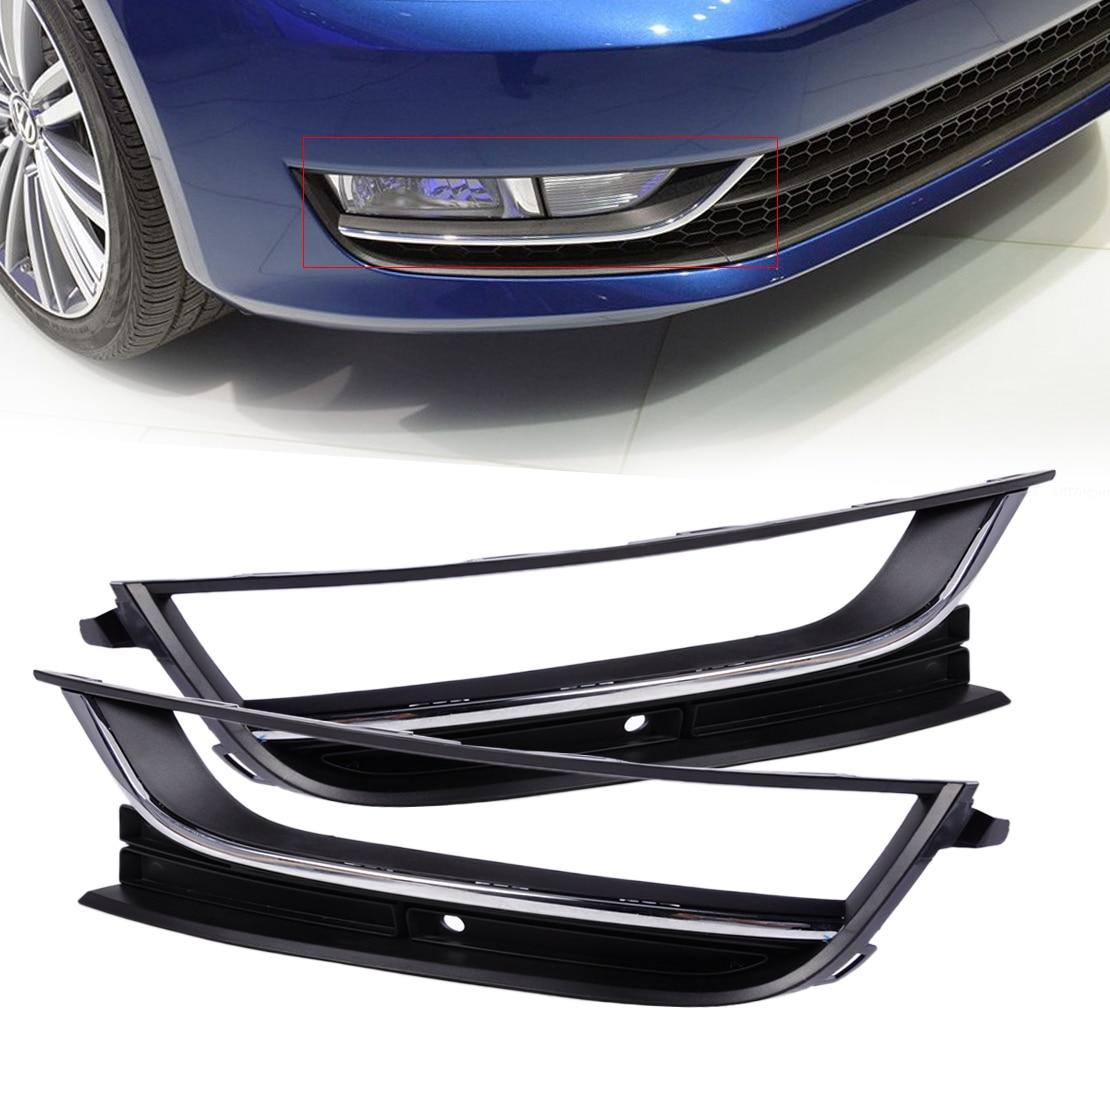 DWCX 56D853665 56D853666 Front Bumper Left + Right Fog Light Lamp Grille for VW Passat NMS 2012 2013 2014 only America Model<br>